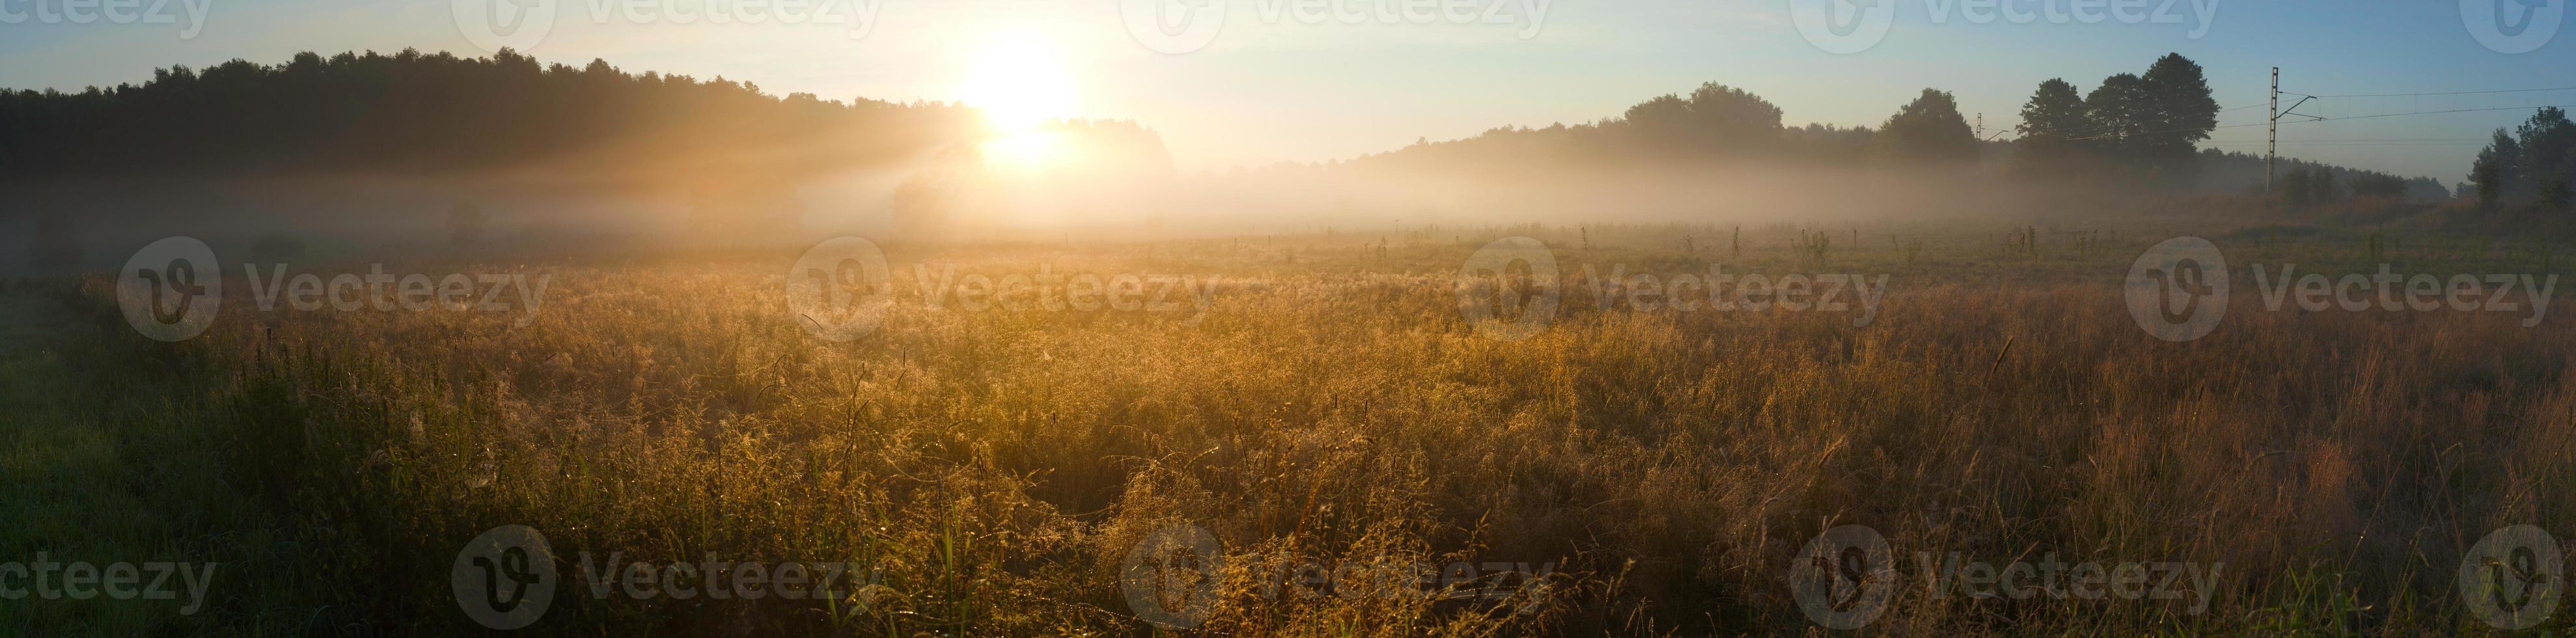 Sunrise over the misty field photo